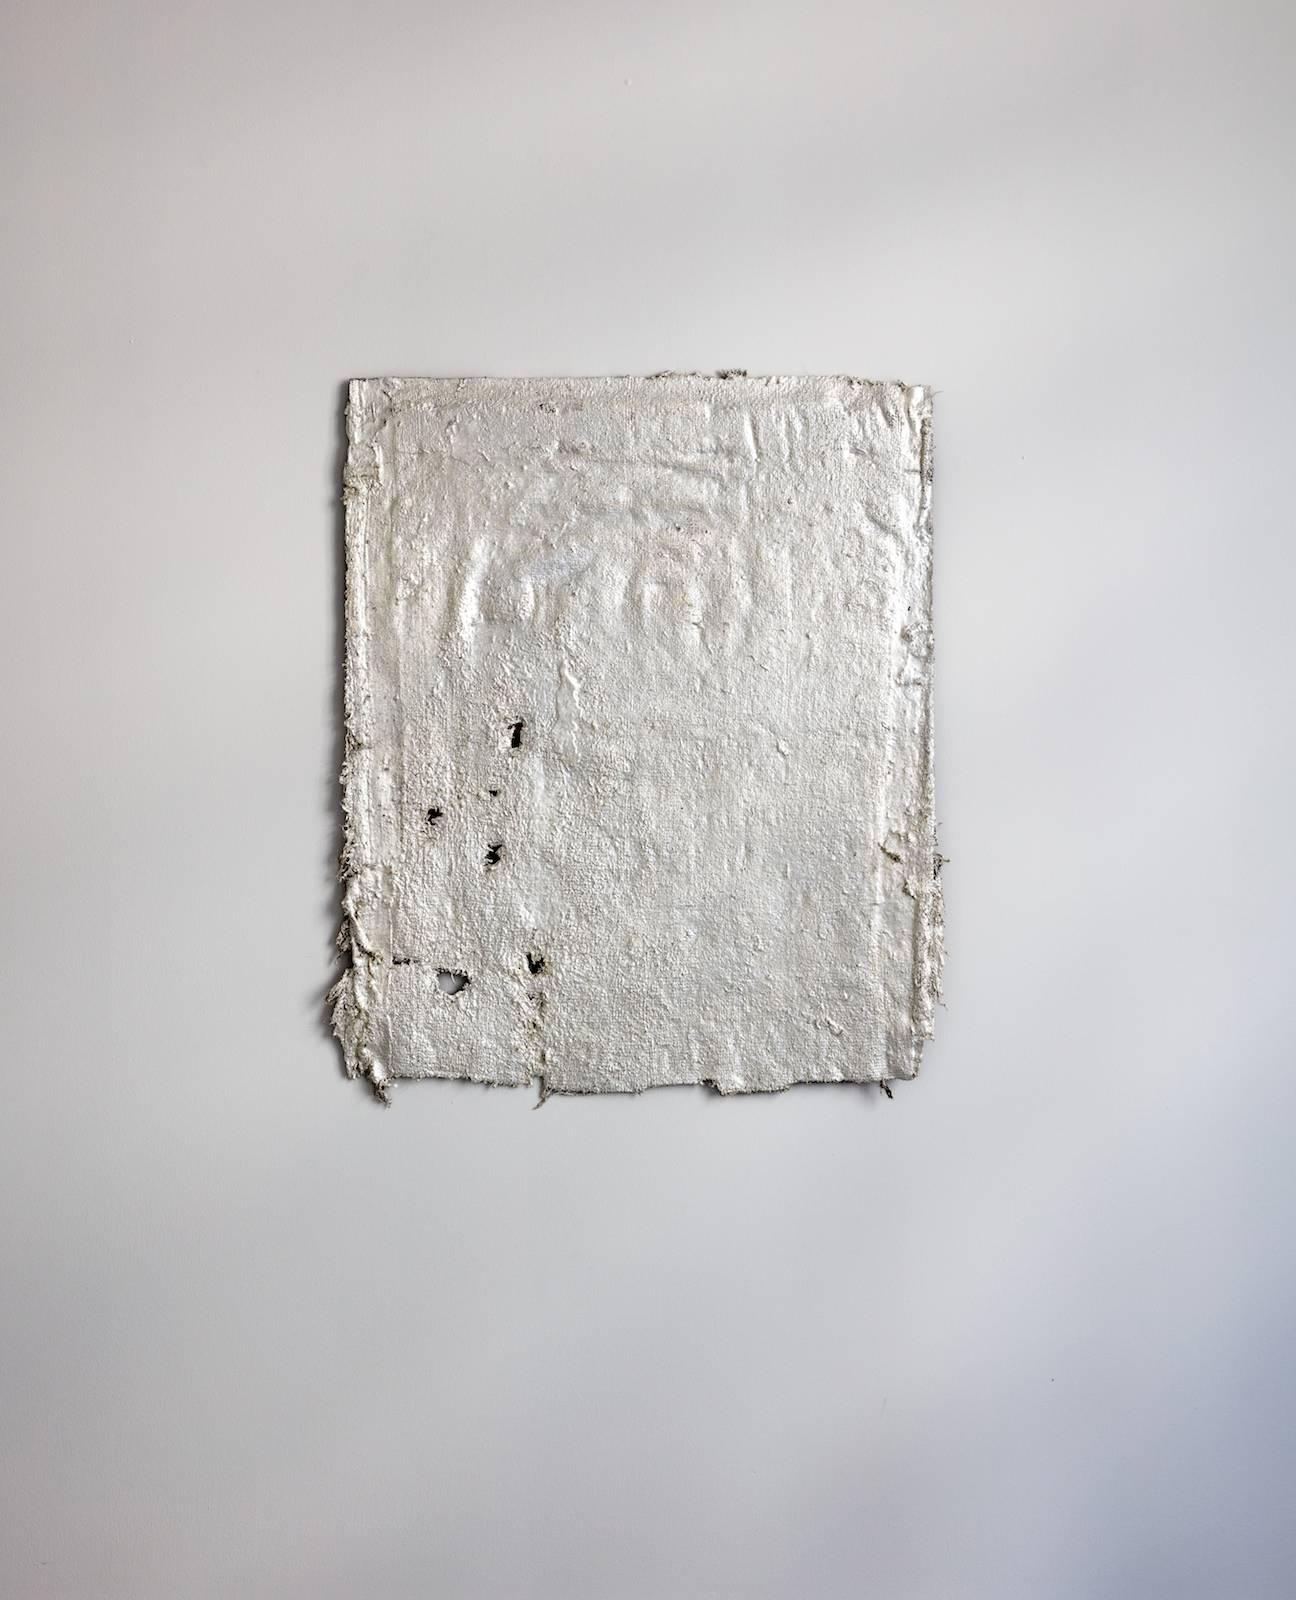 …tearing through these quarters…, 2017, baluch rug, ruler, silverleaf, lacquer, 82 x 69,5 cm